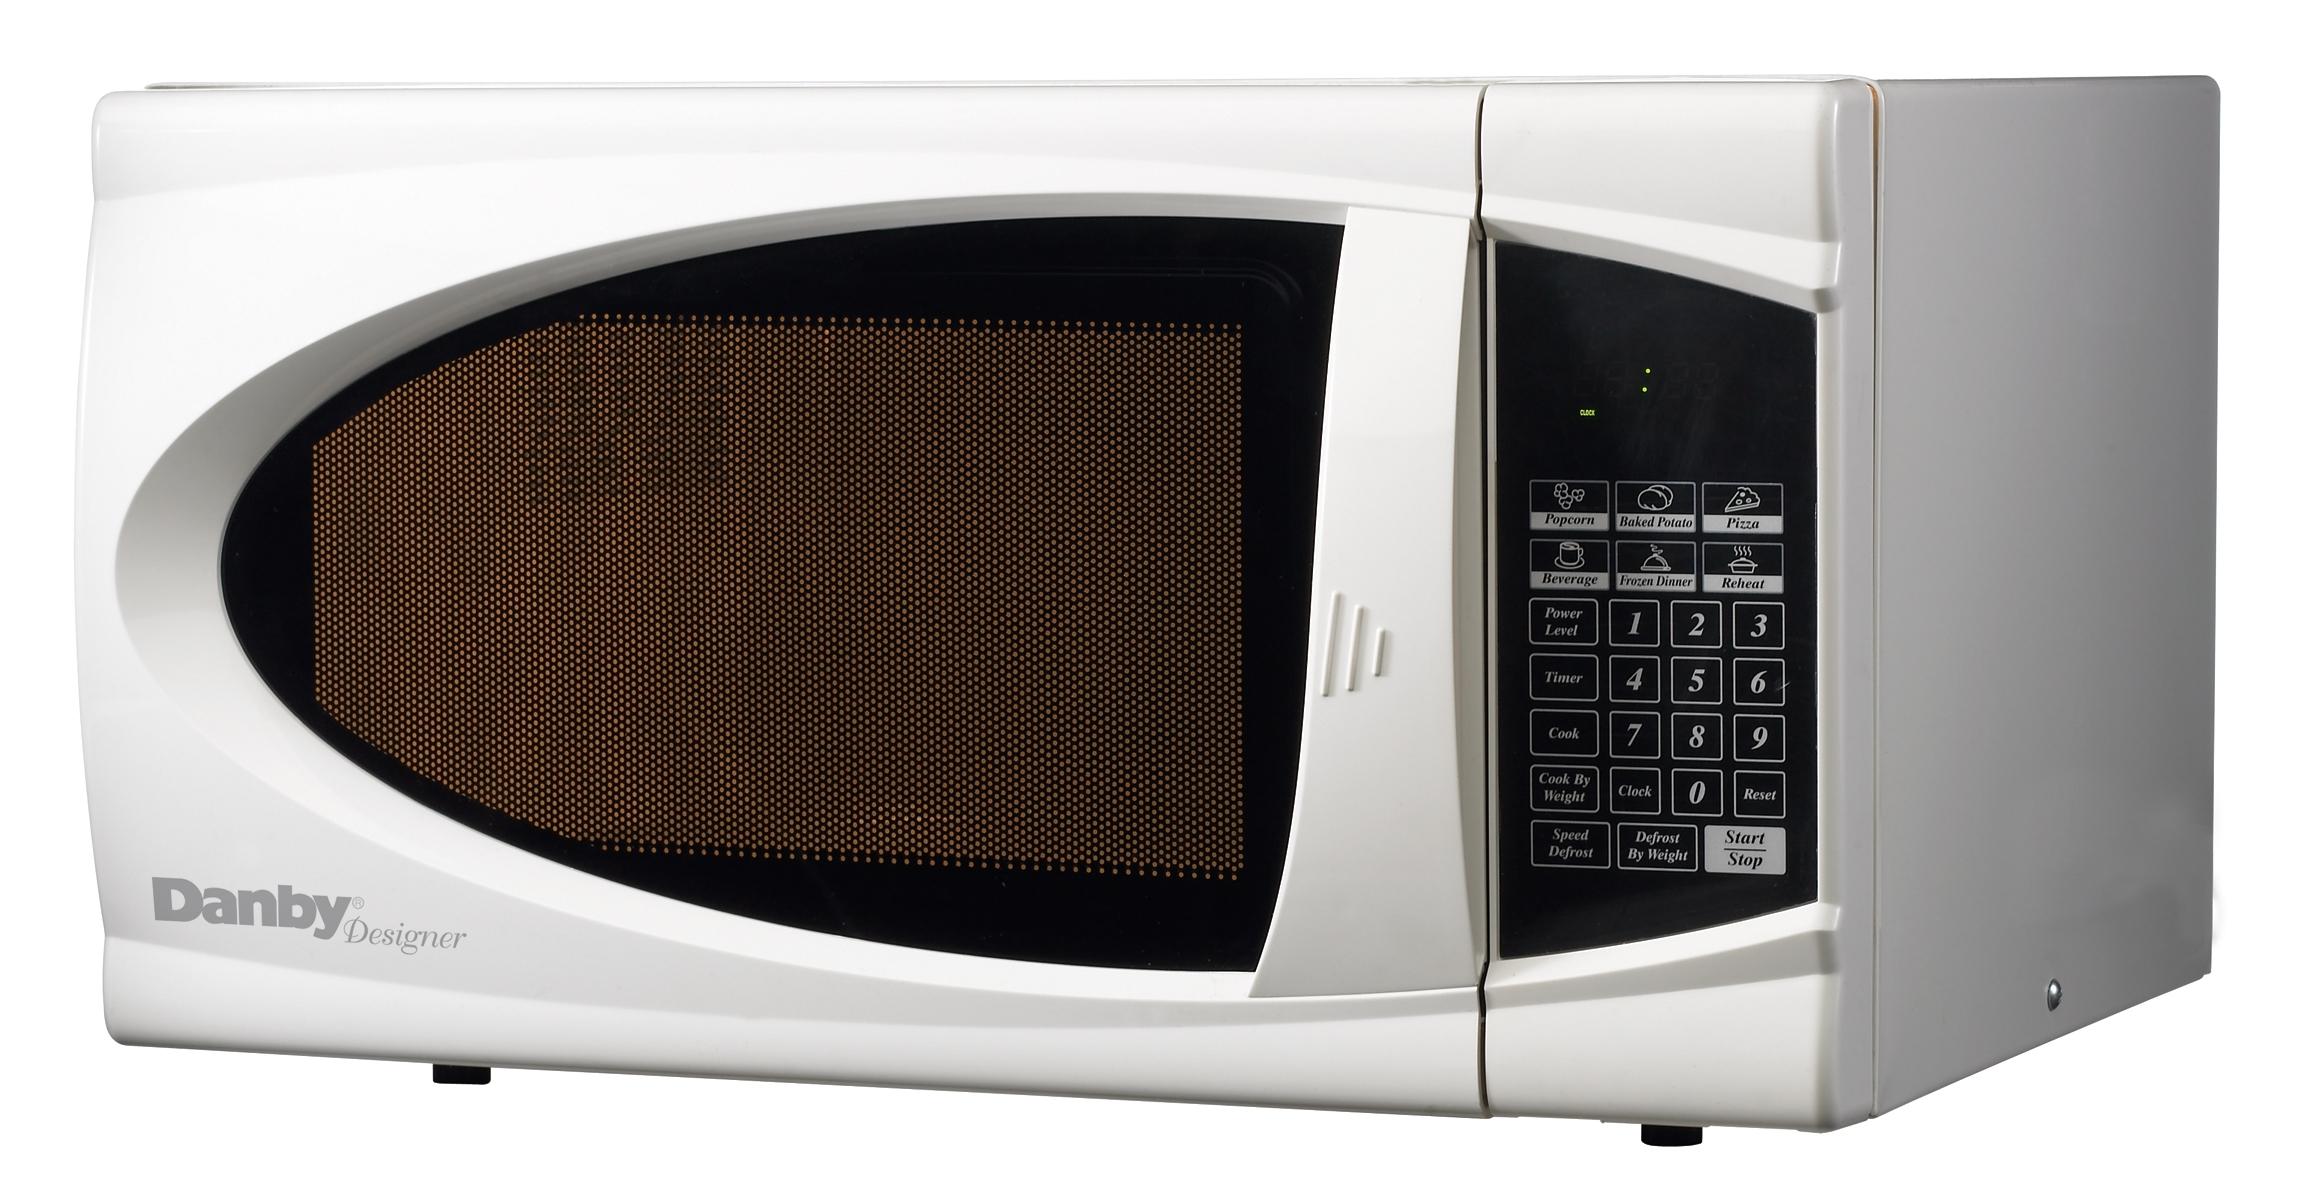 Danby Microwave DMW799W LEFT